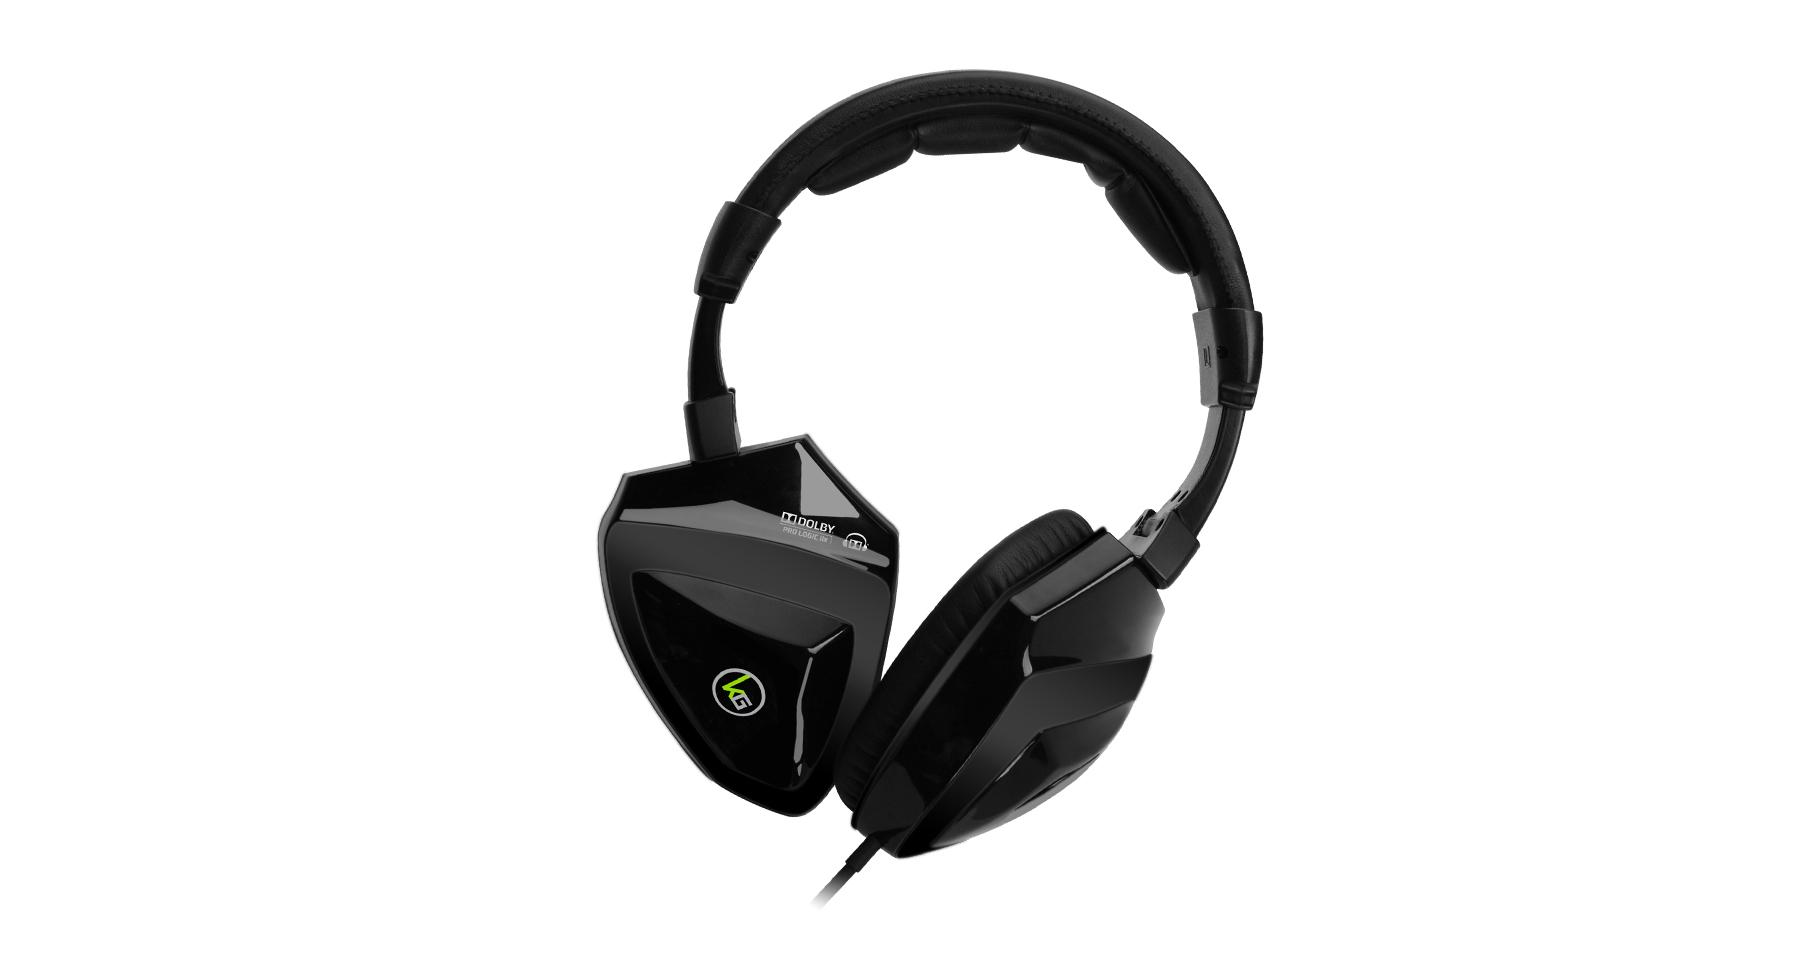 12e9a2f3340 IOGEAR - GHG700 - Kaliber Gaming™ SAGA Surround Sound Gaming Headphones